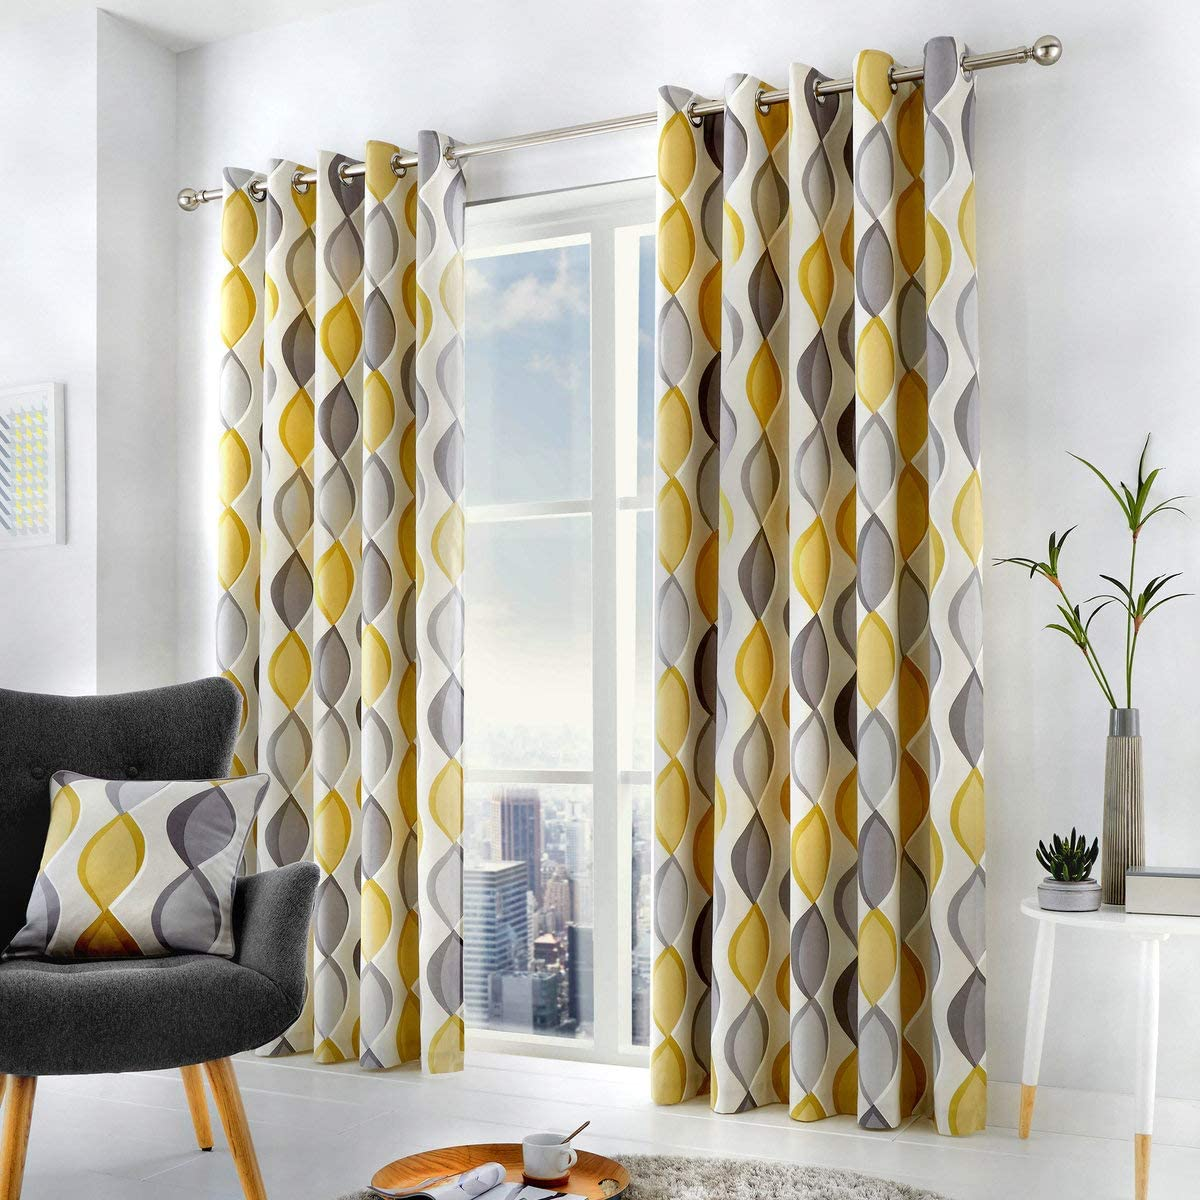 "Fusion - Lennox - 100% Cotton Ready Made Pair of Eyelet Curtains - 90"" Width x 72"" Drop (229 x 183cm) in Grey W229cm (90) x D183cm (72) Grey"